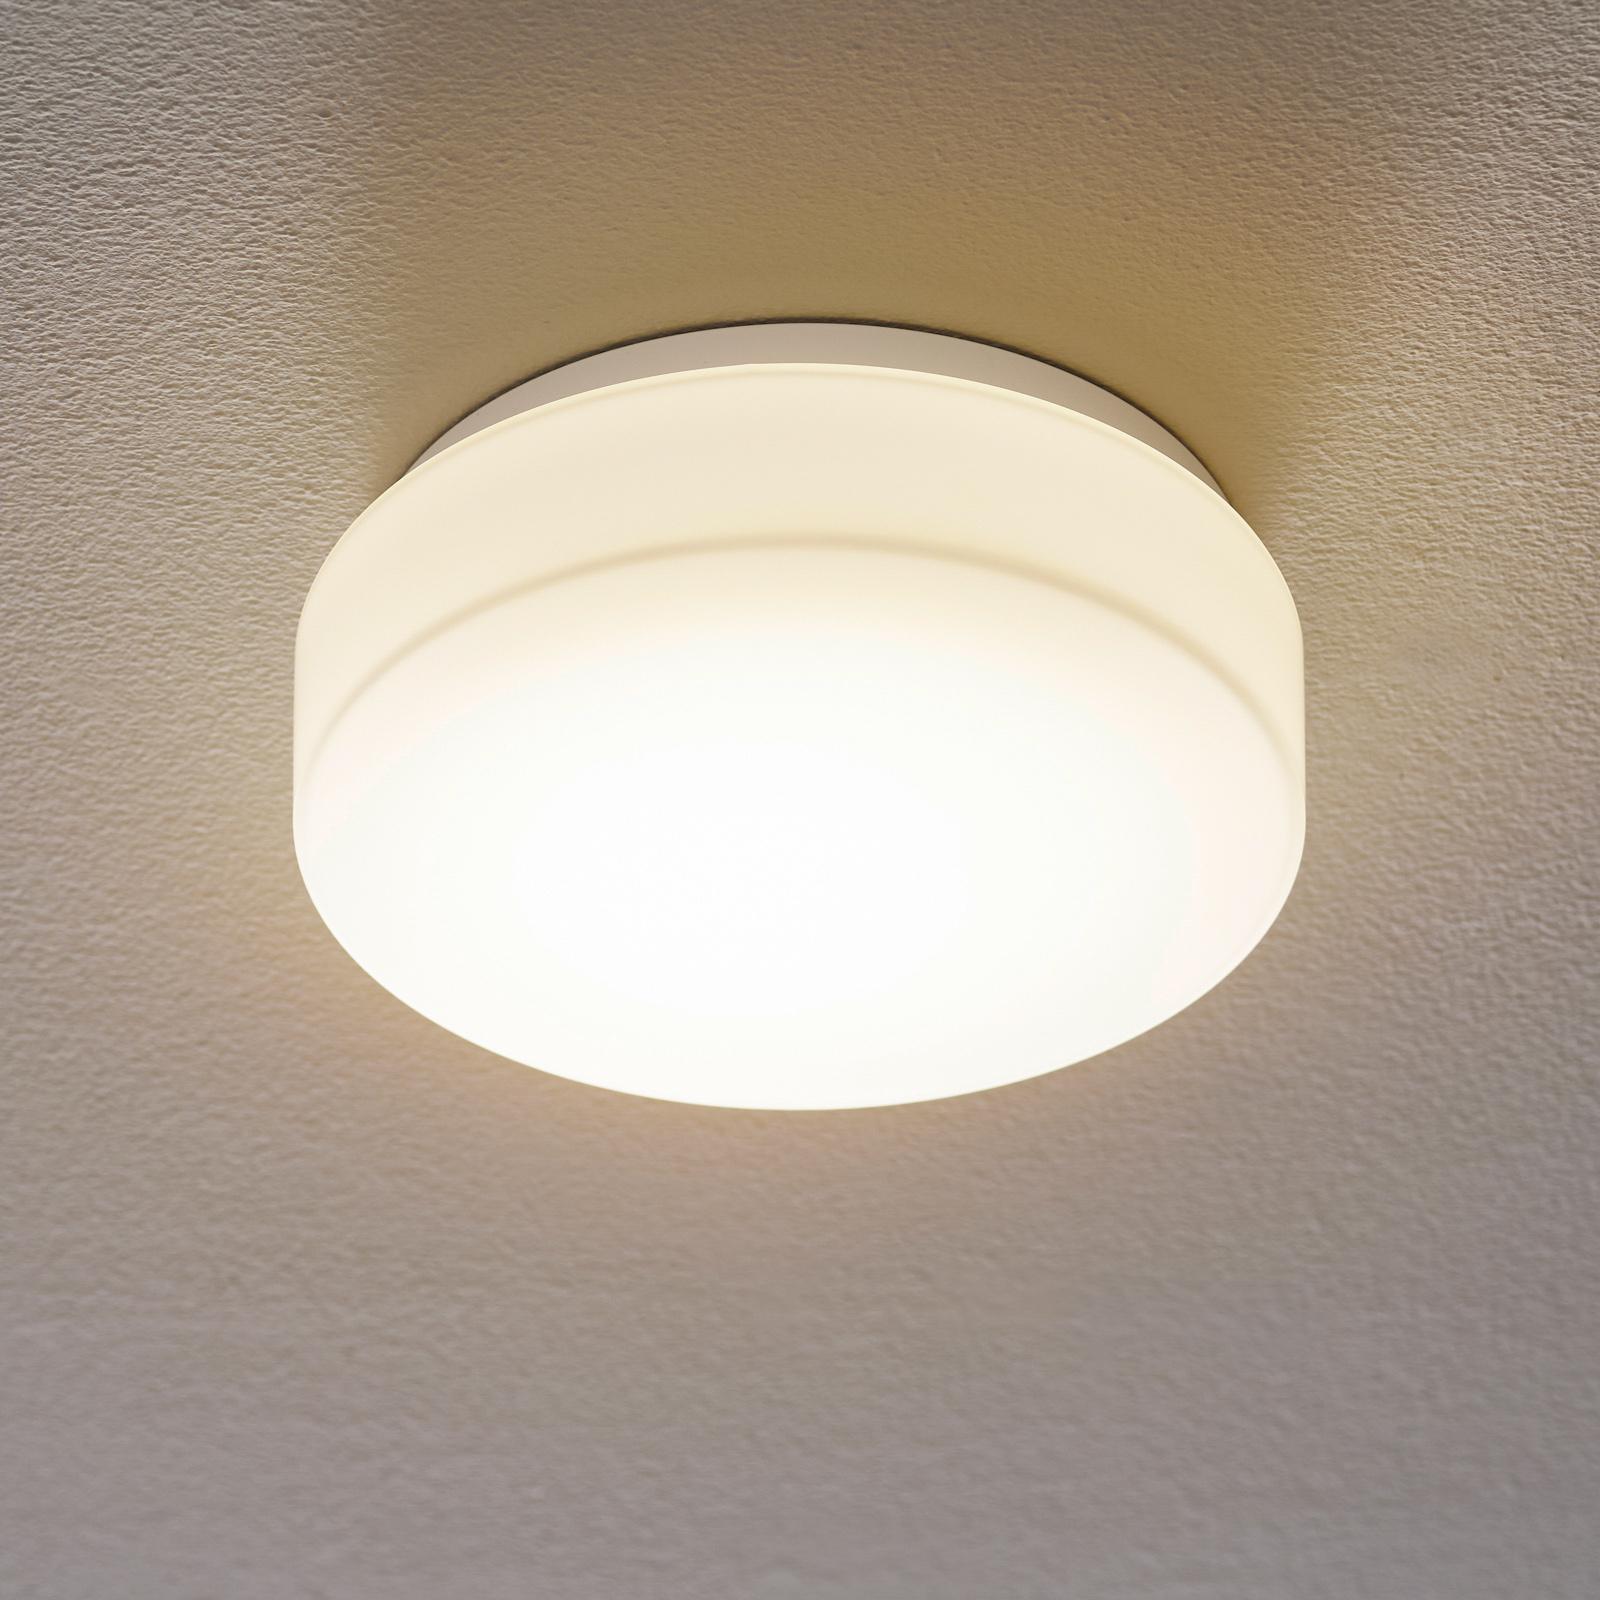 BEGA 50078 lampa sufitowa LED DALI 3000K Ø25cm